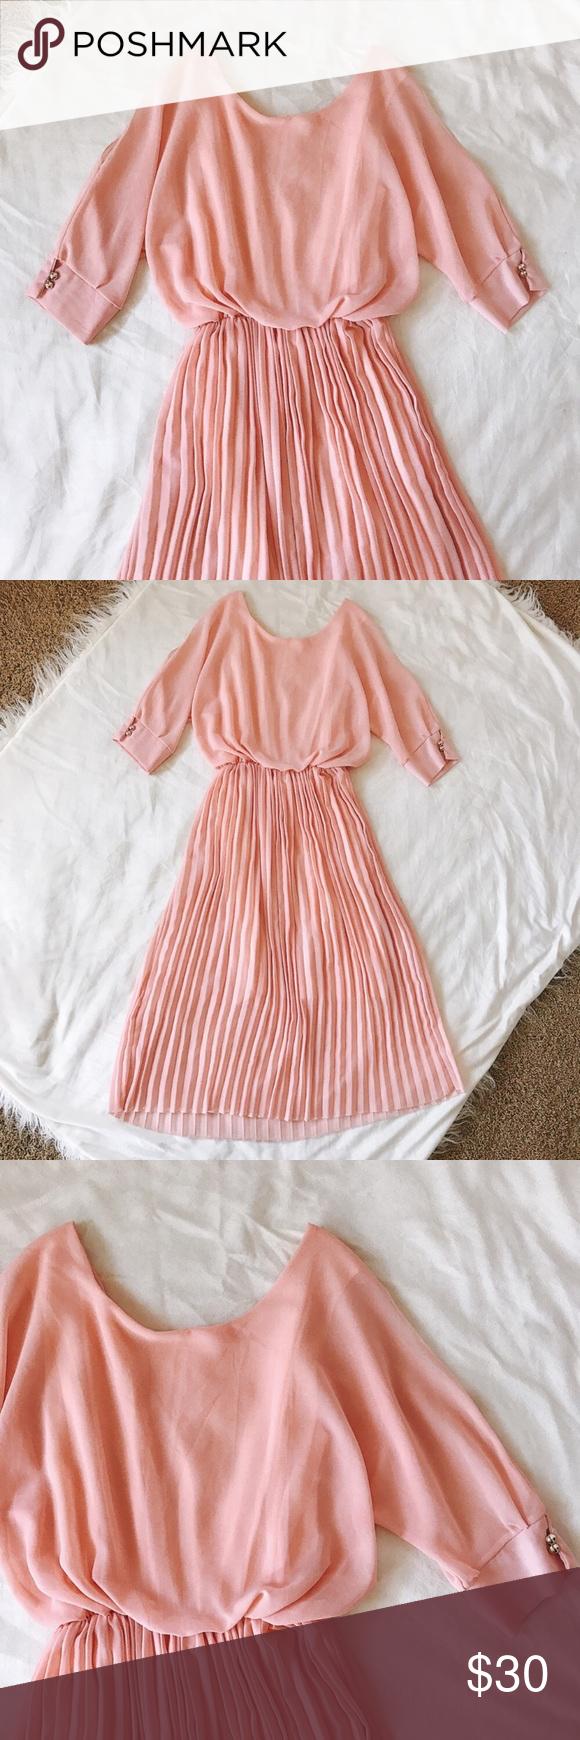 Vintage poppy dress beautiful pink vintage dress featuring figure